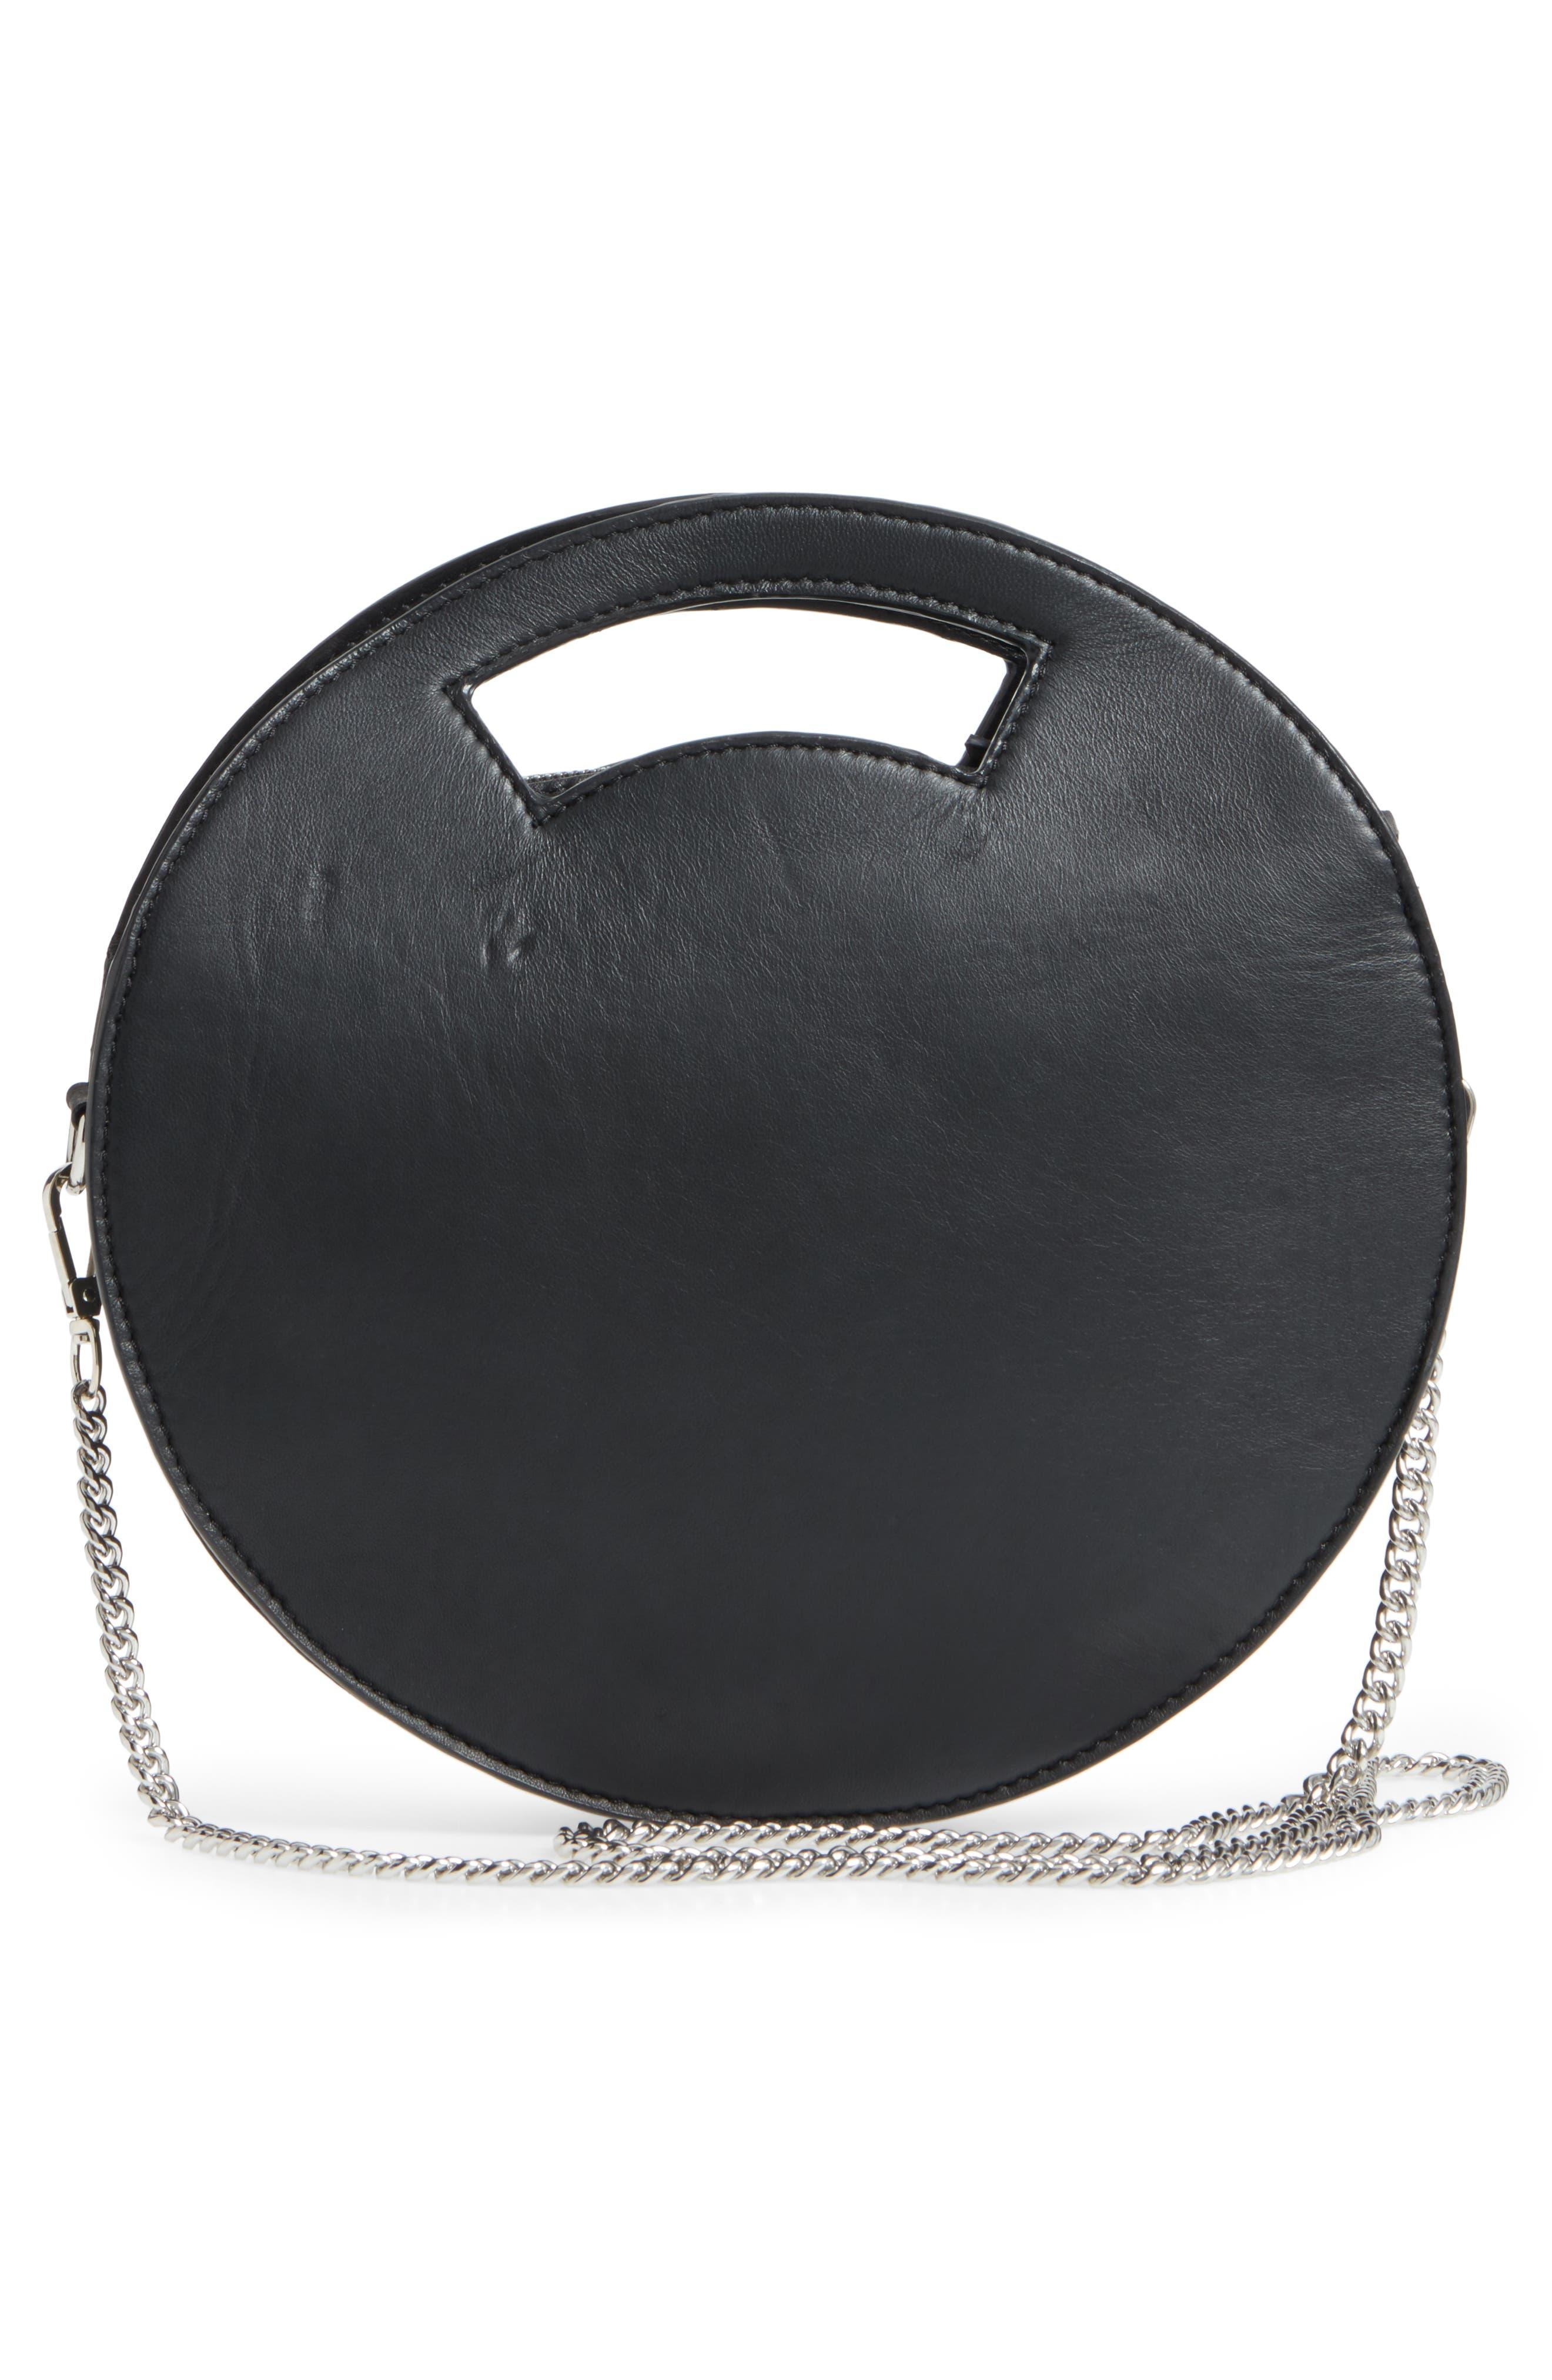 Premium Leather Circle Crossbody Bag,                             Alternate thumbnail 3, color,                             001